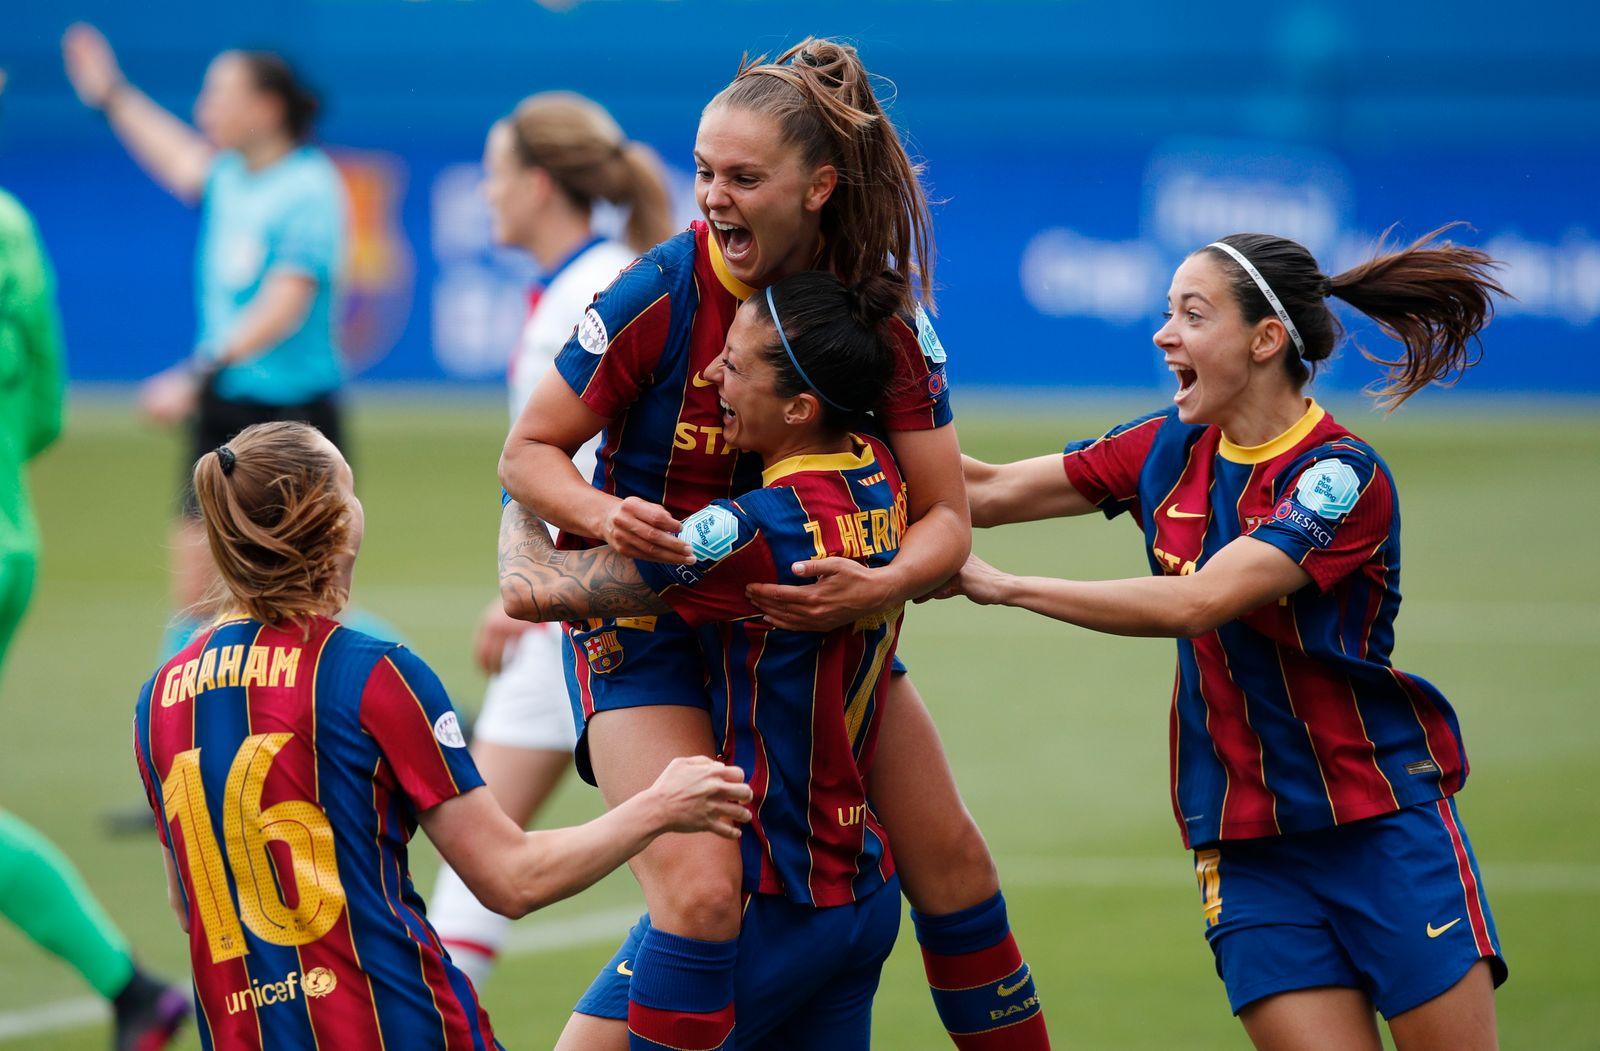 Women's Champions League - Semi Final Second Leg - FC Barcelona v Paris St Germain